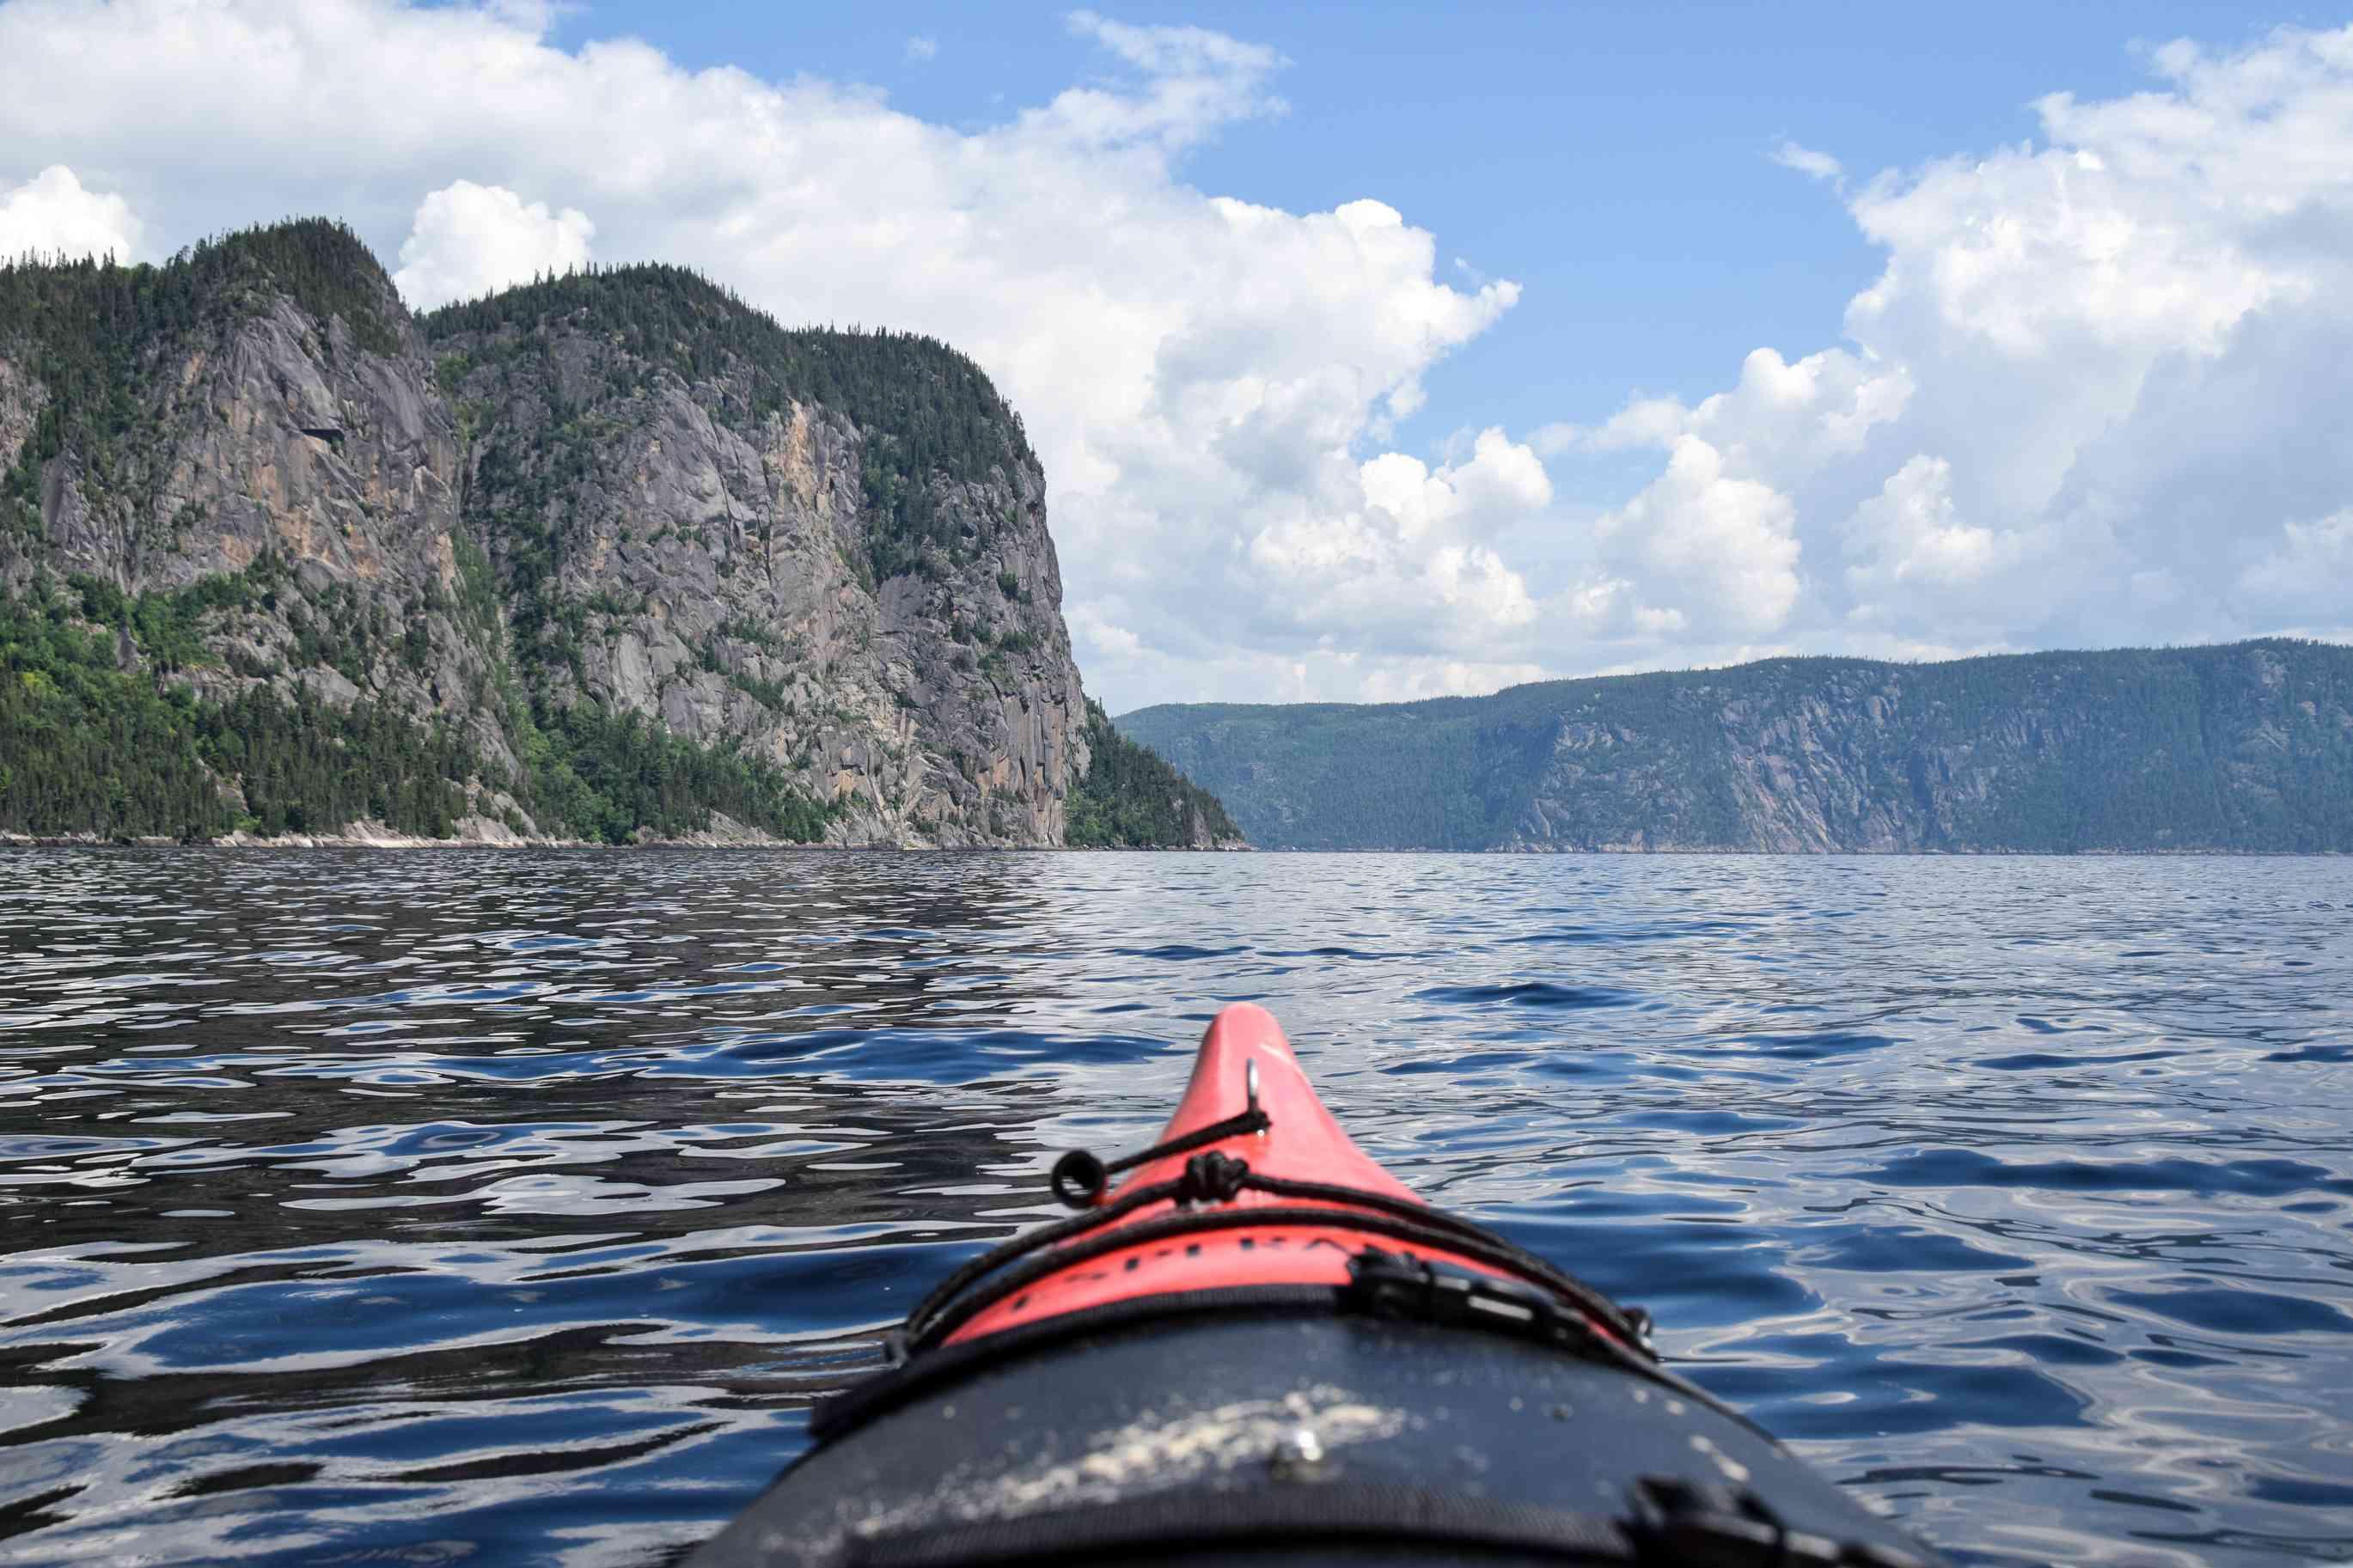 A kayak floating through Saguenay Fjord